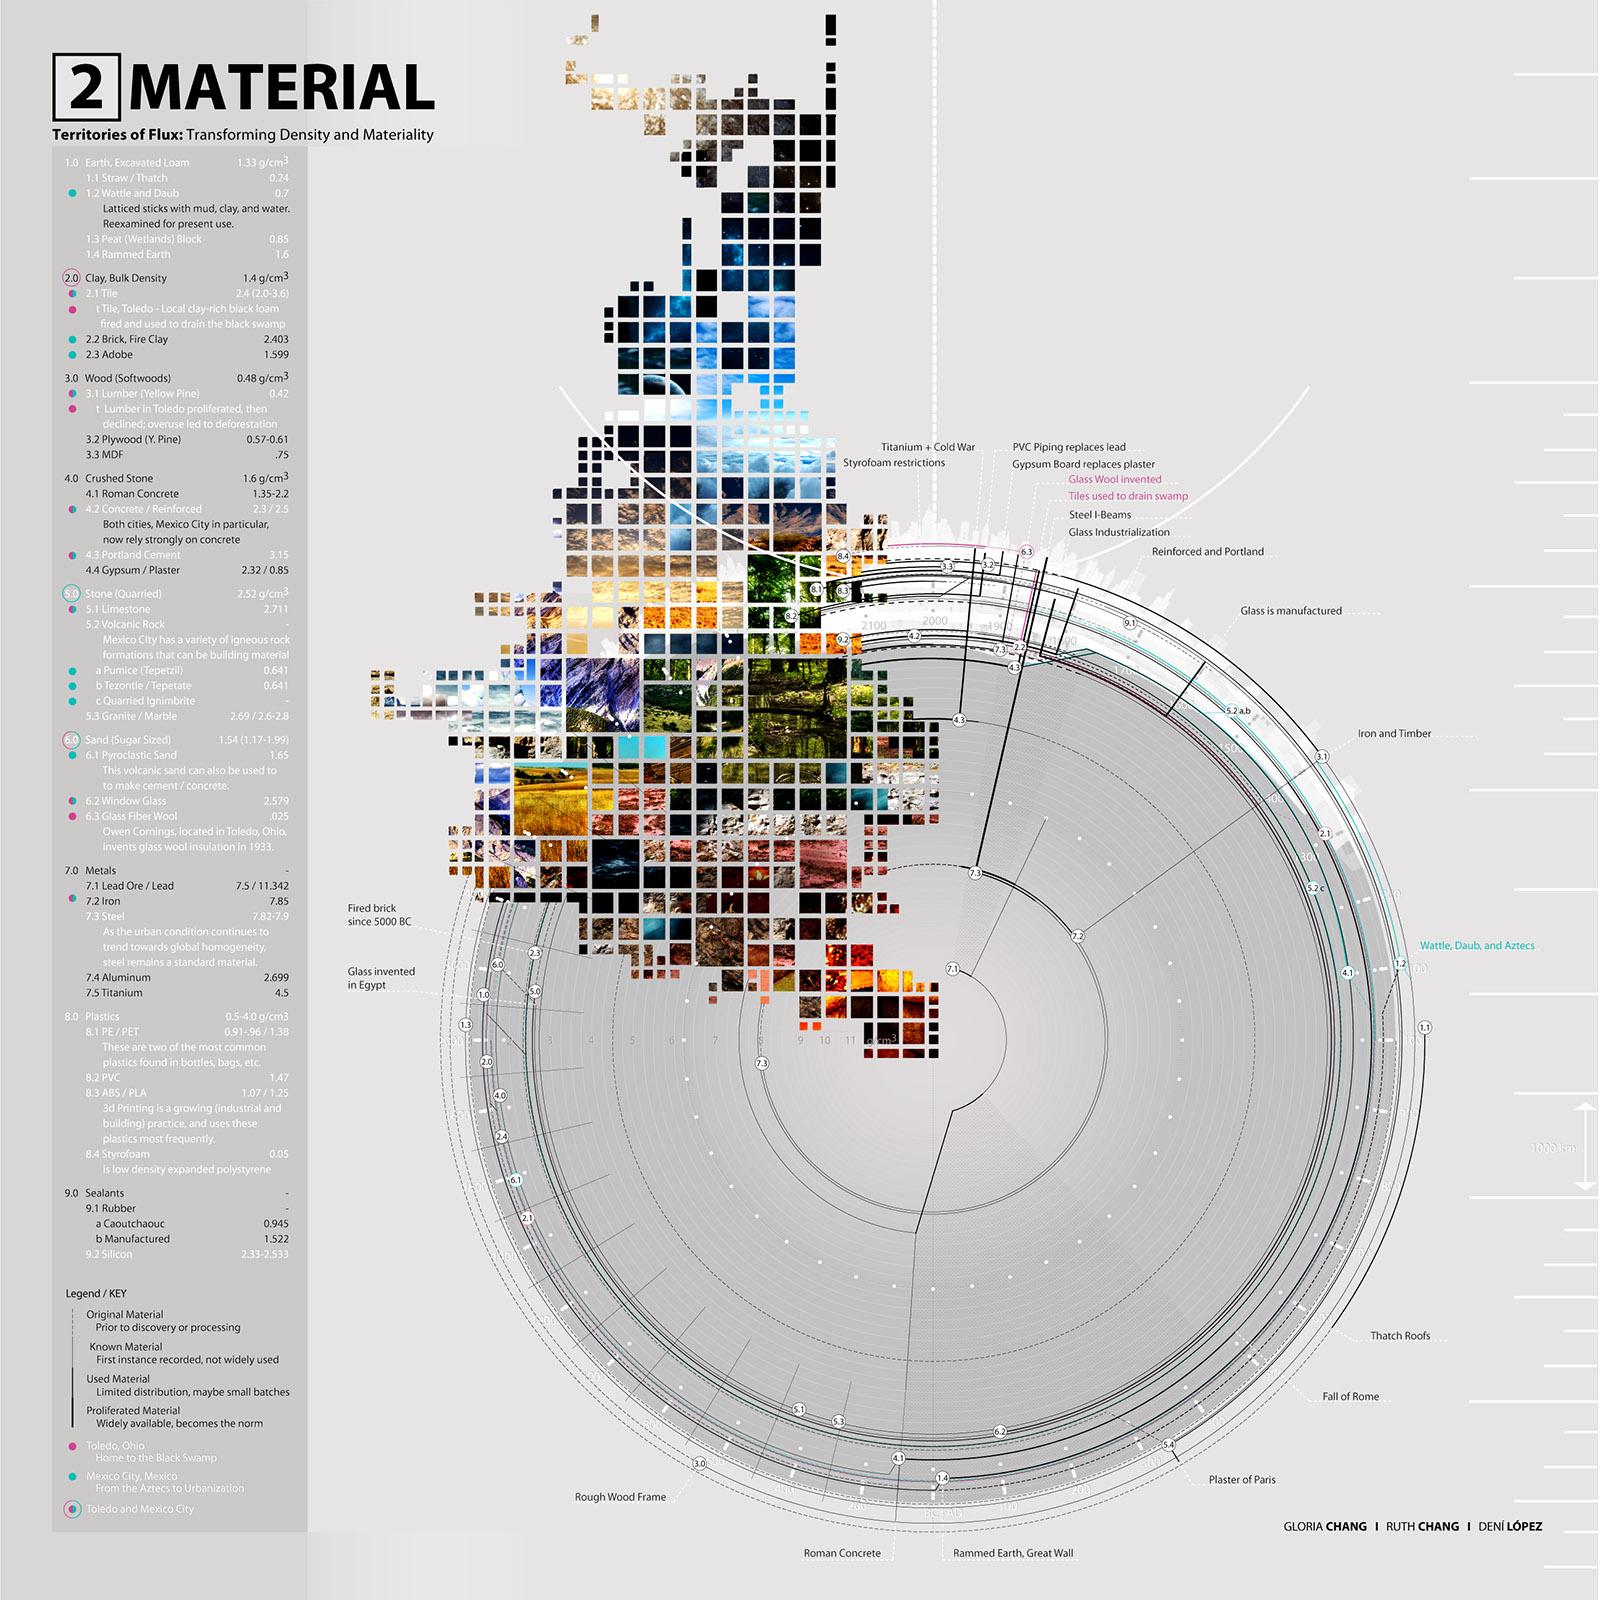 Territories of Flux - Material